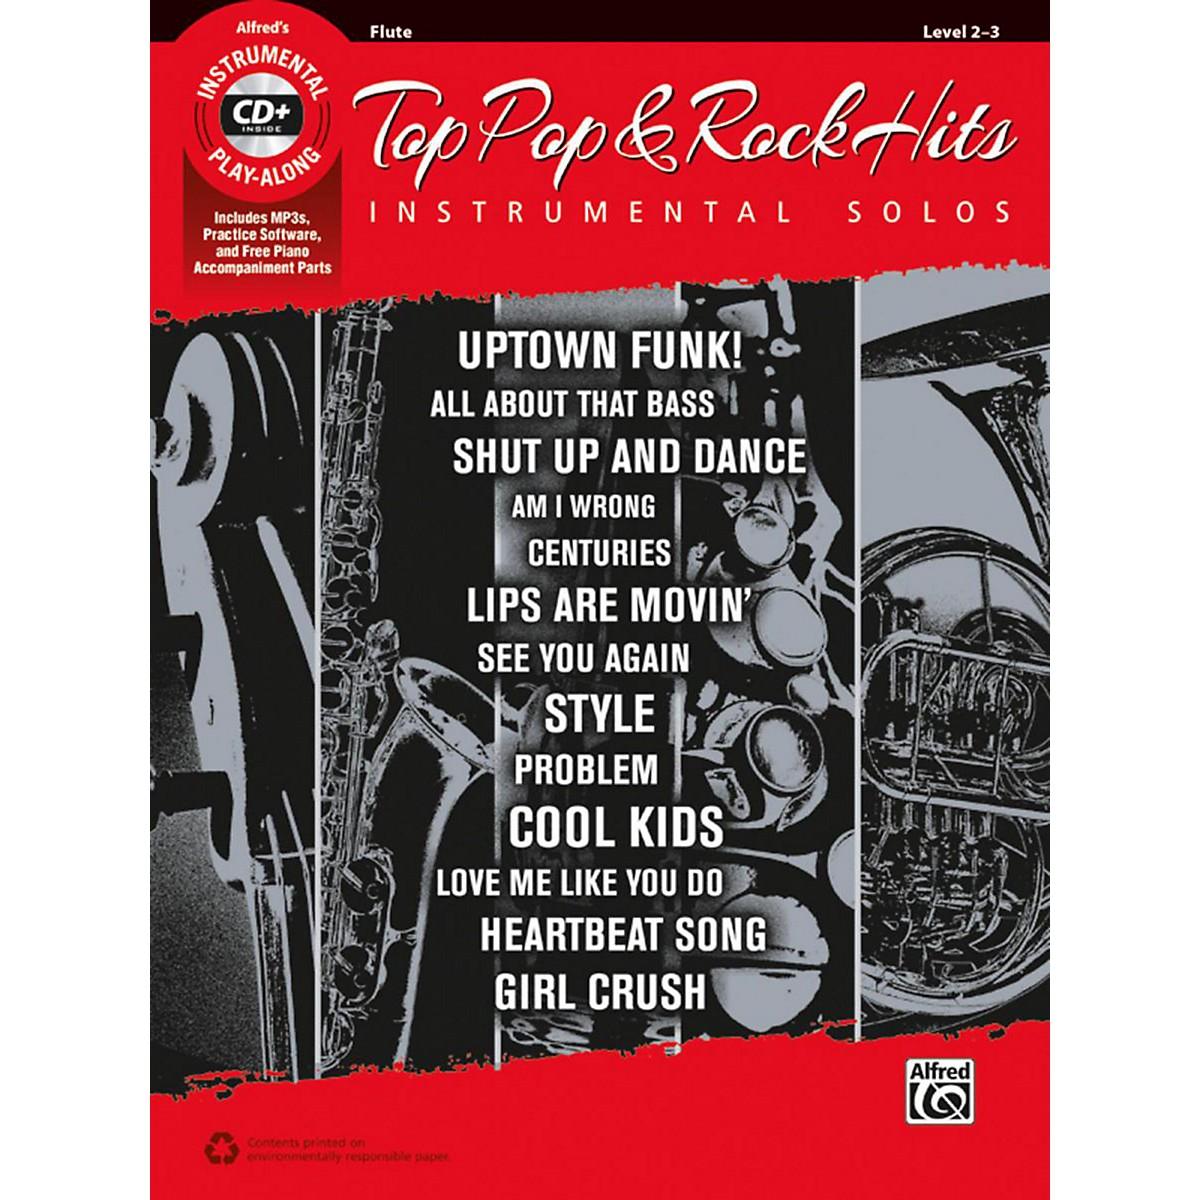 Alfred Top Pop & Rock Hits Instrumental Solos Flute Book & CD